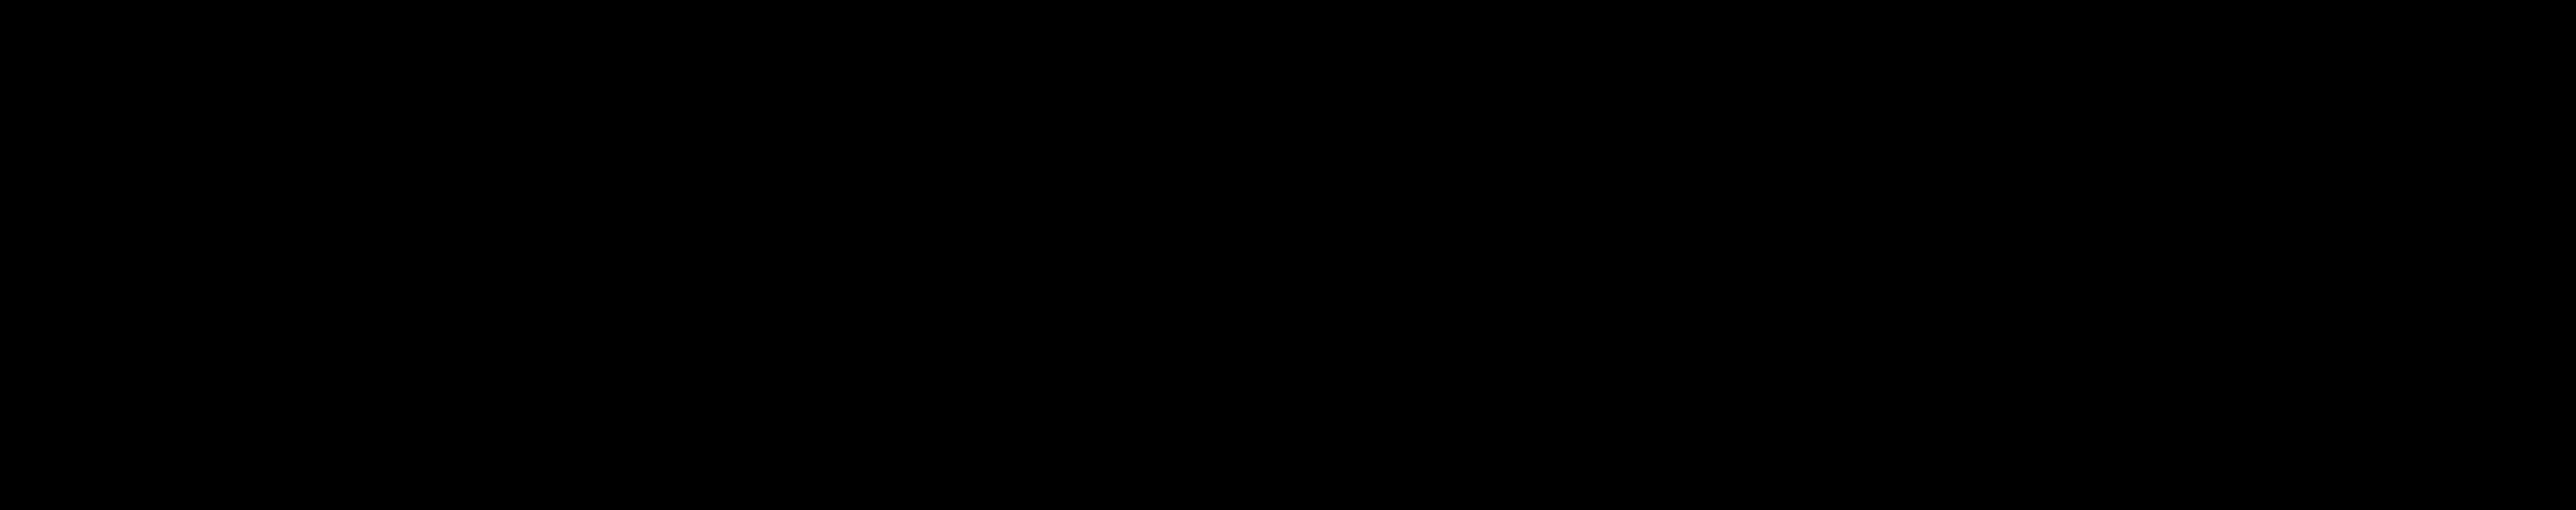 Logo Östermalm - Est. 1998 - @ostermalm - ostermalm.com